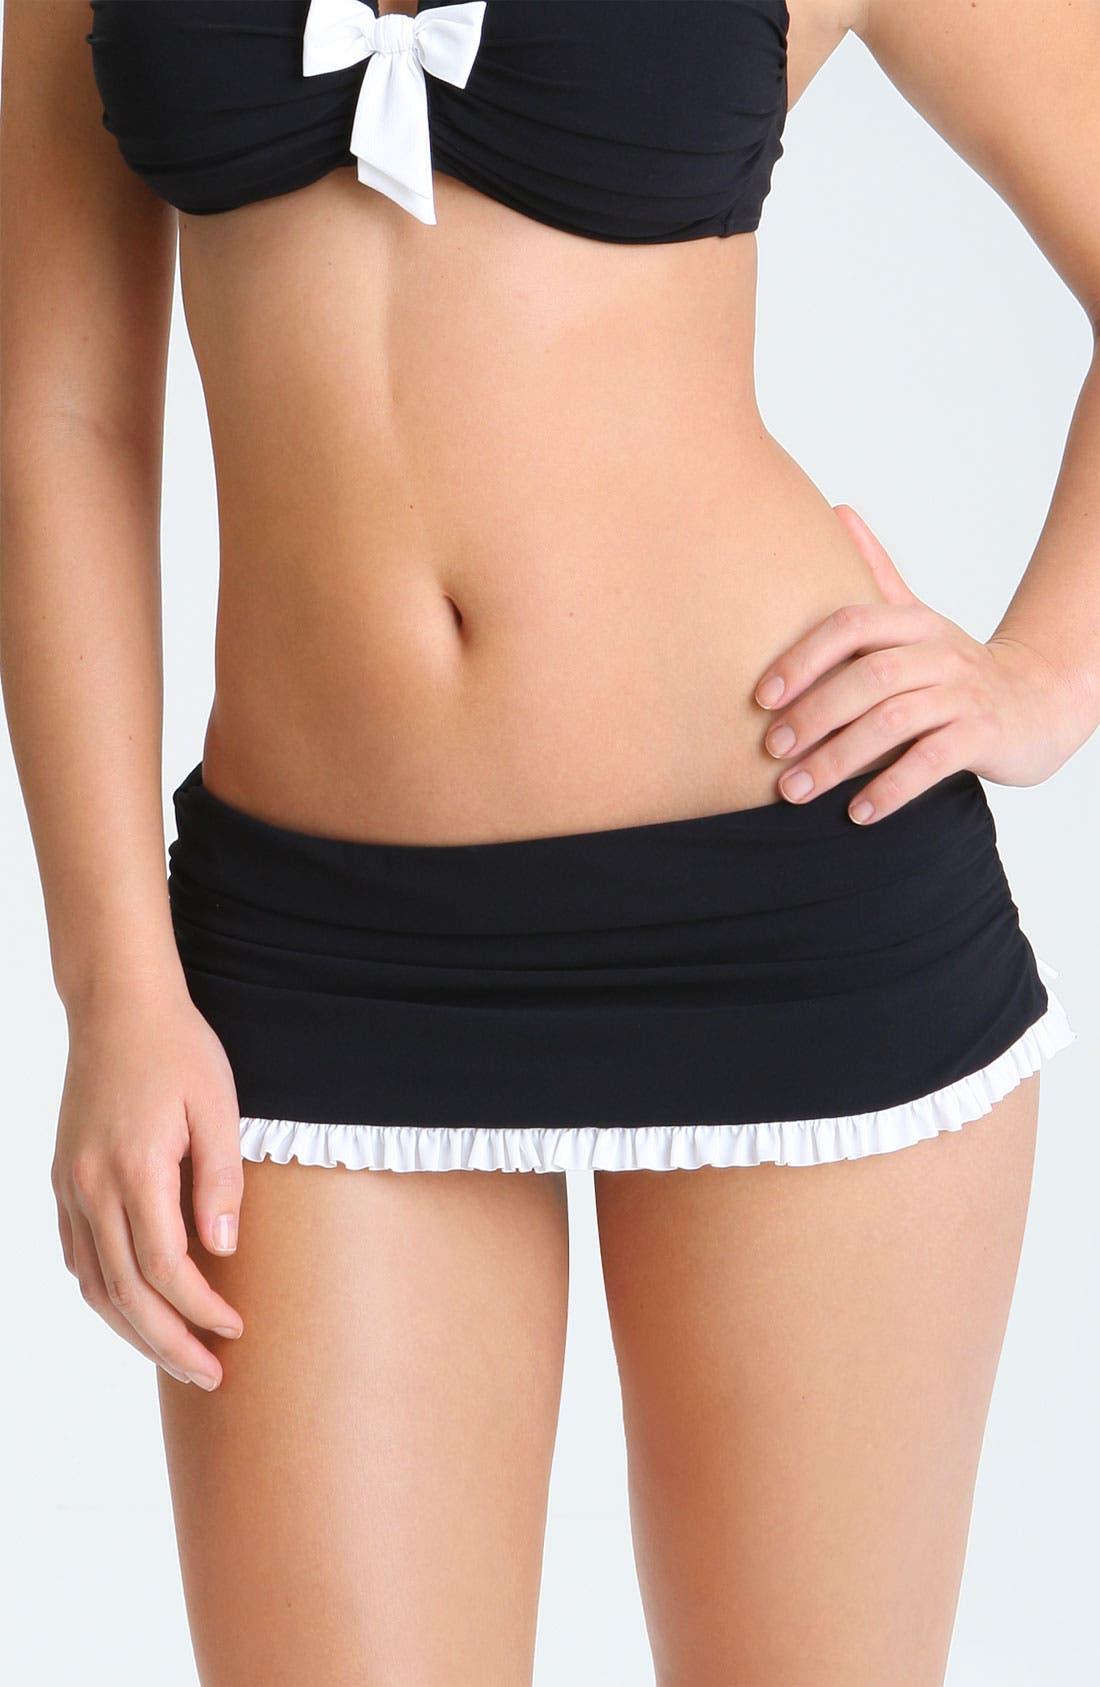 Alternate Image 1 Selected - Profile by Gottex 'Black Tie' Skirted Bikini Bottoms